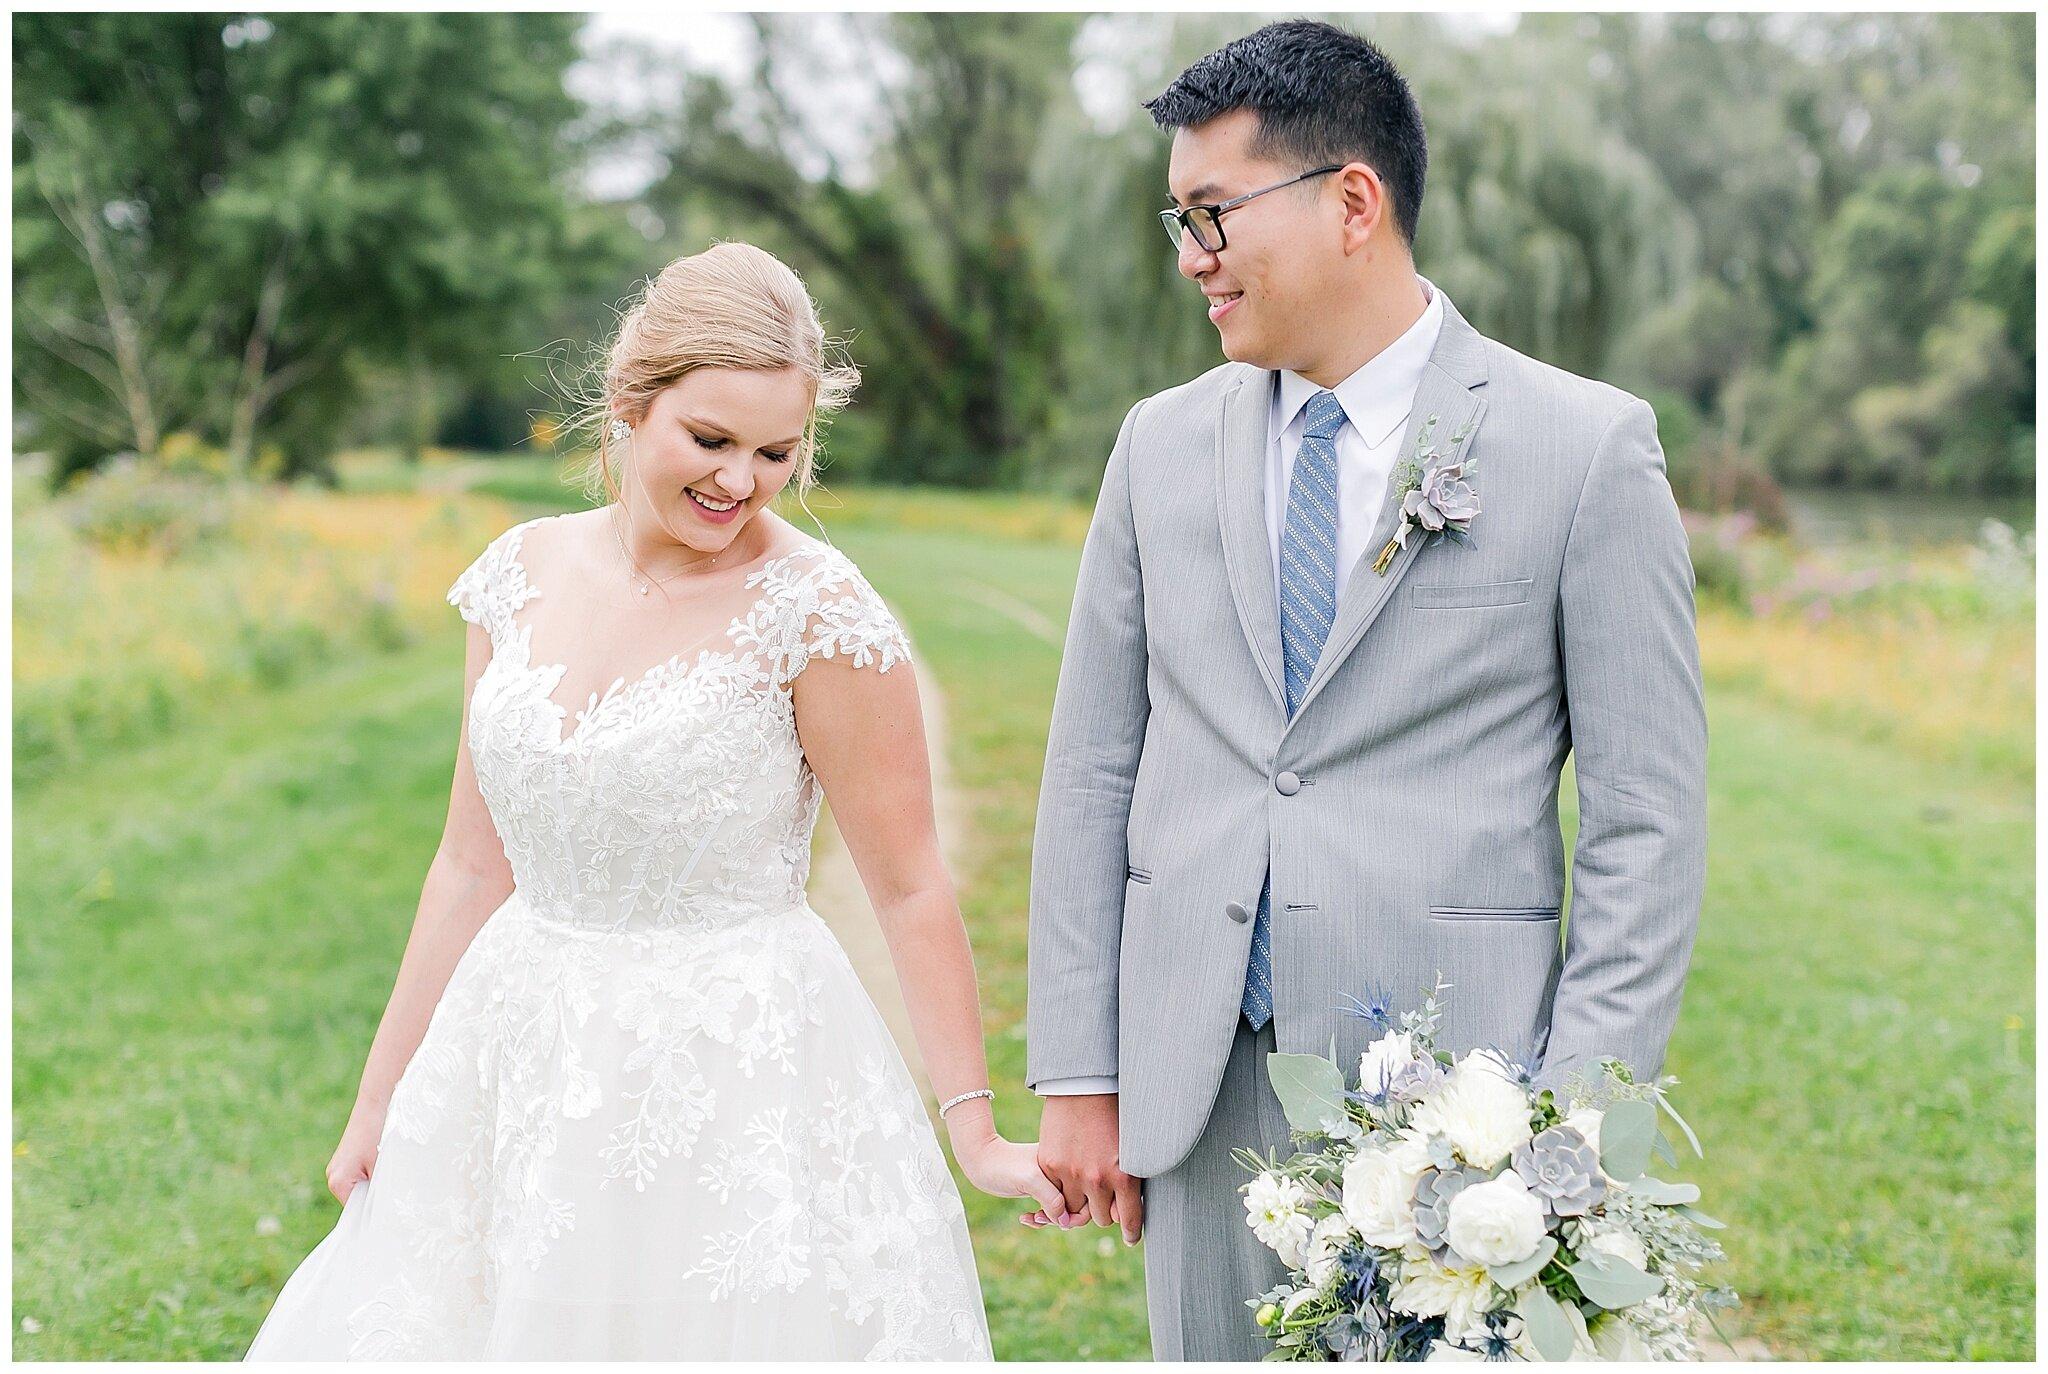 the_lageret_stoughton_wisconsin_wedding_madison_wisconsin_wedding_photographers_0246.jpg